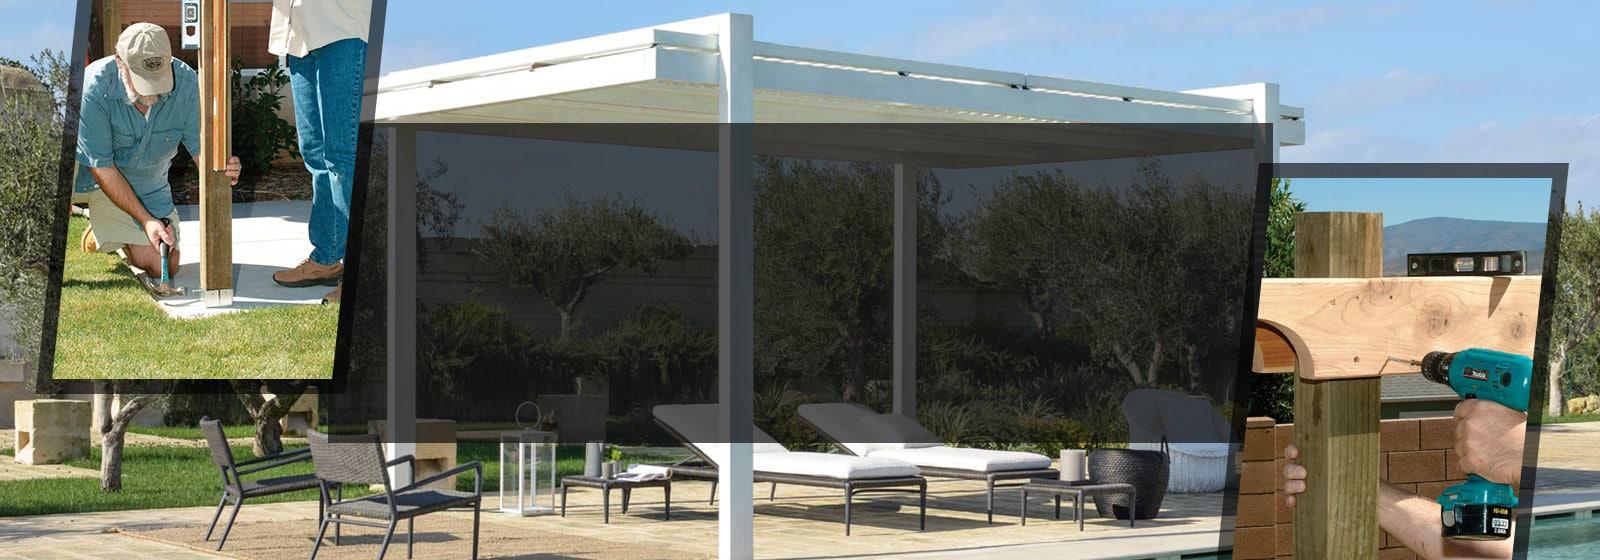 Deck Pergolas Amp Fence Builder San Jose Ca 408 819 2110